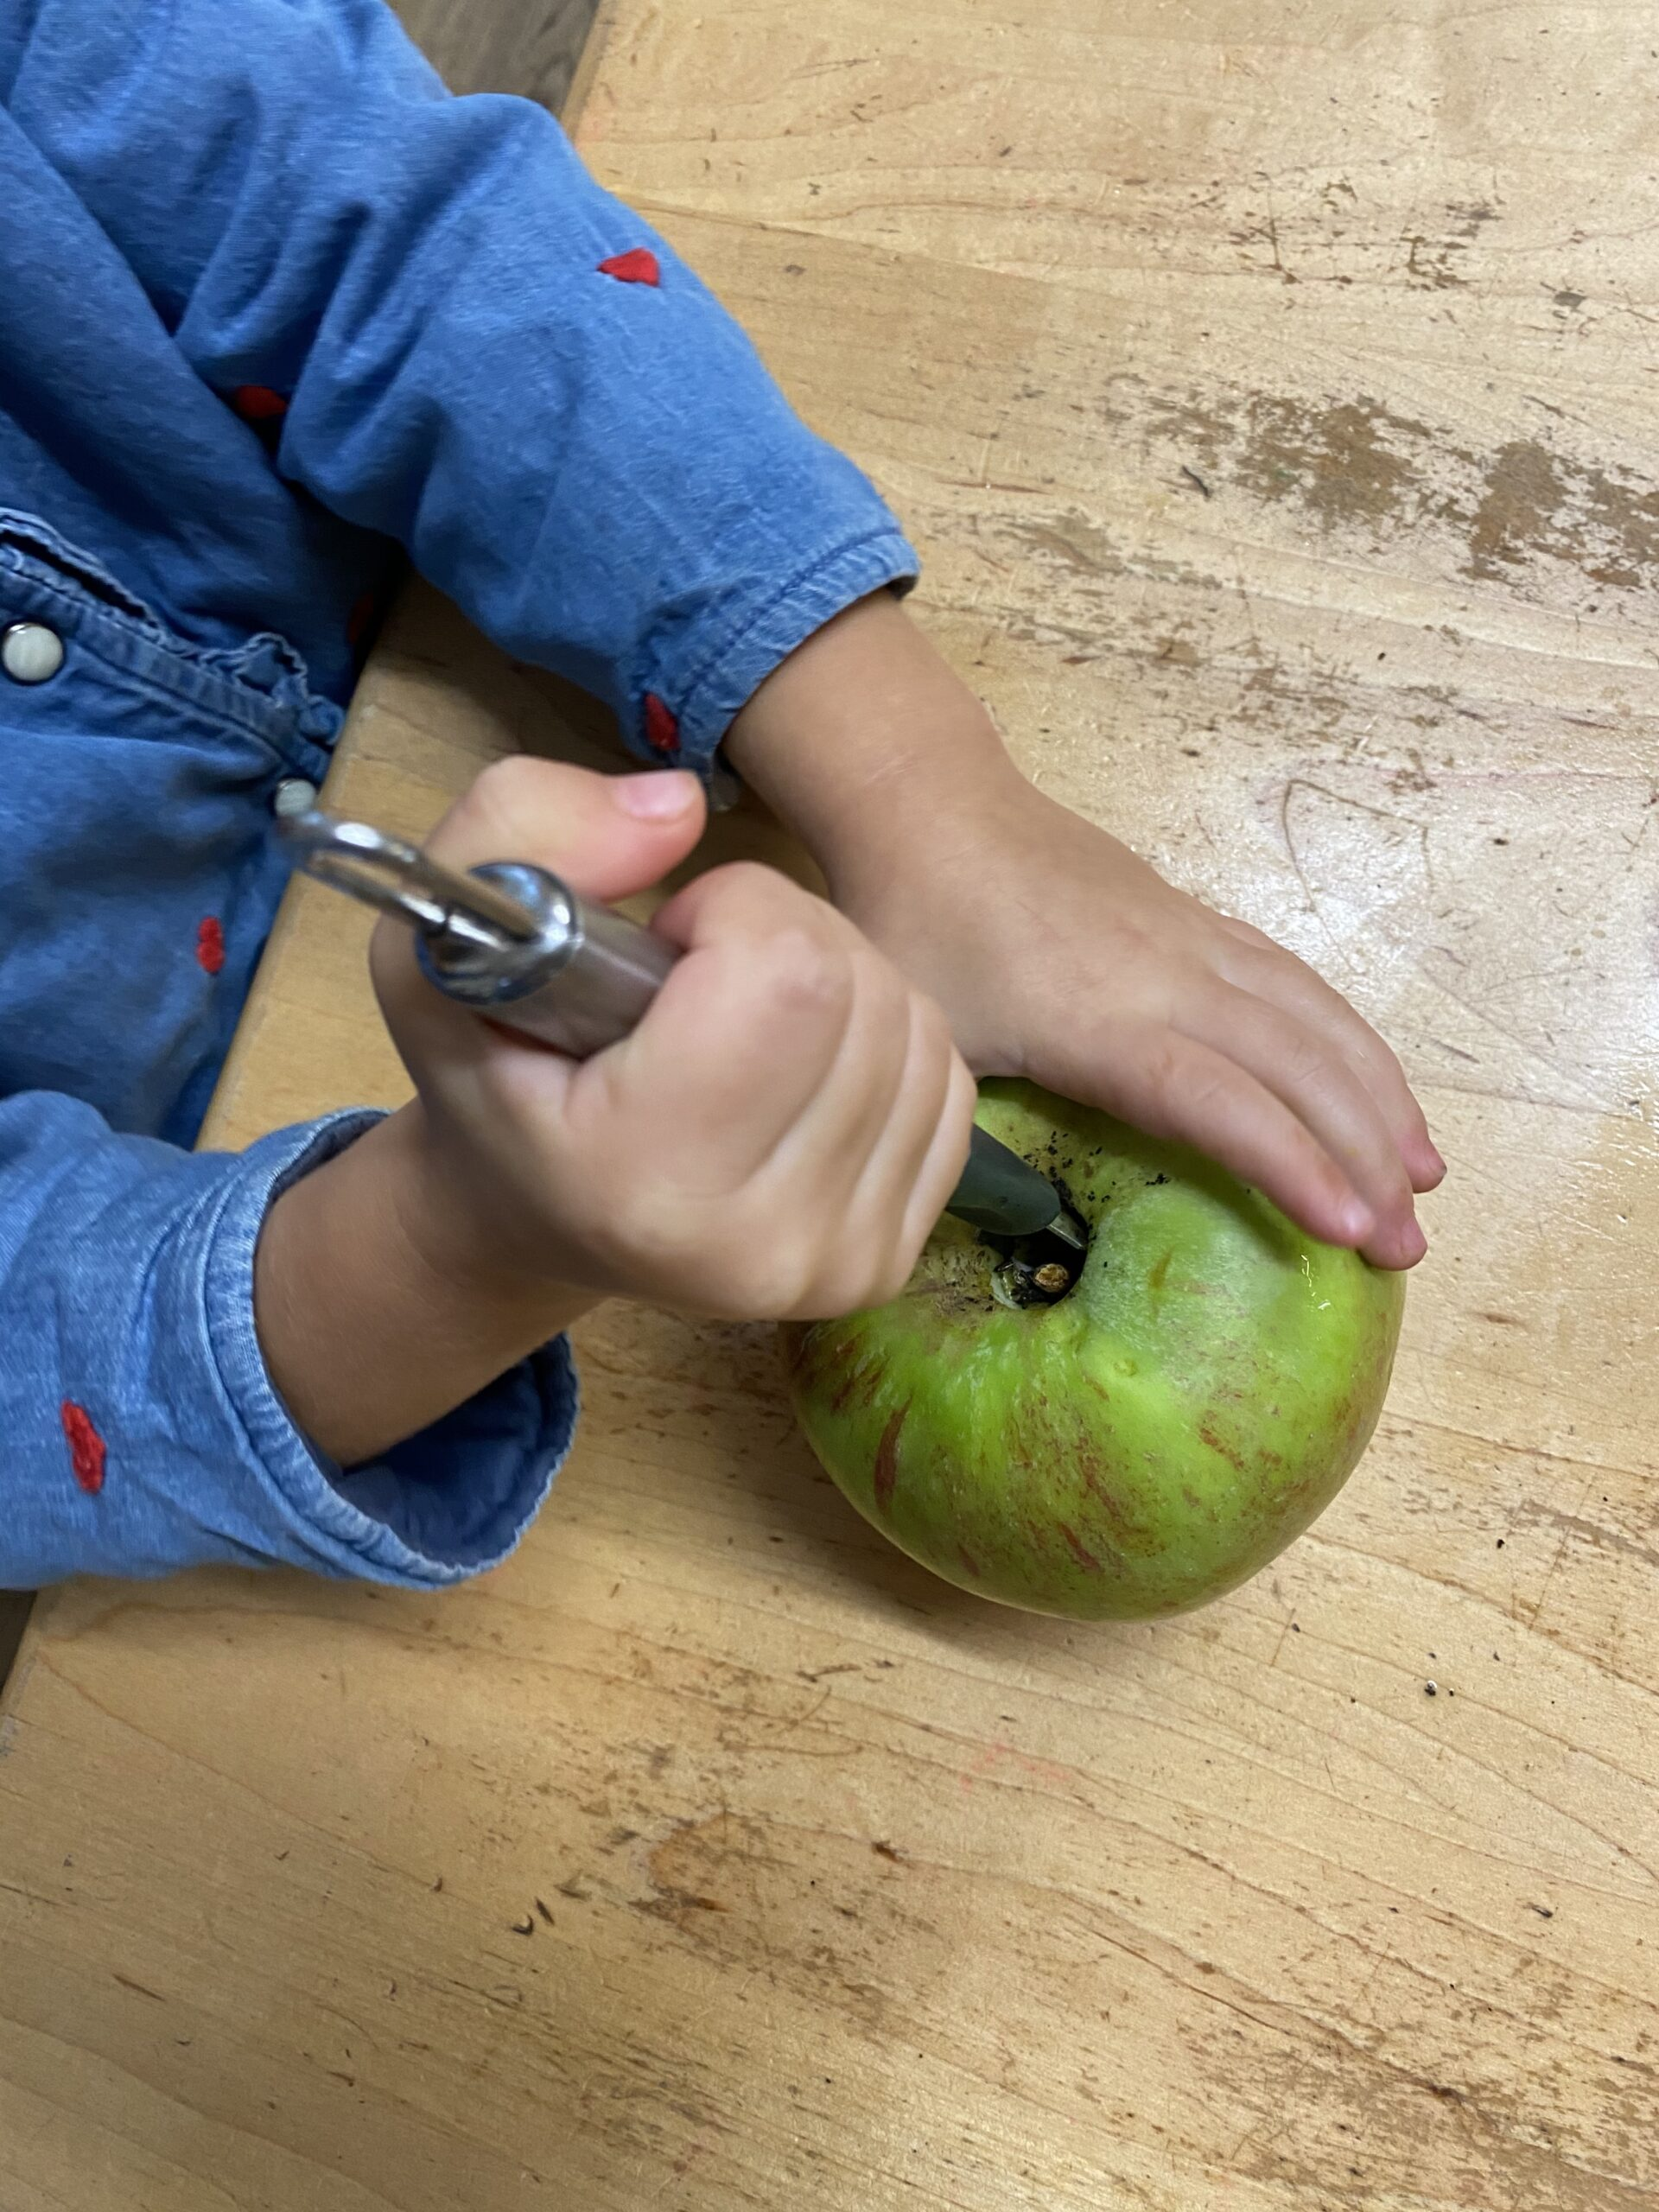 using apple corer to core apple